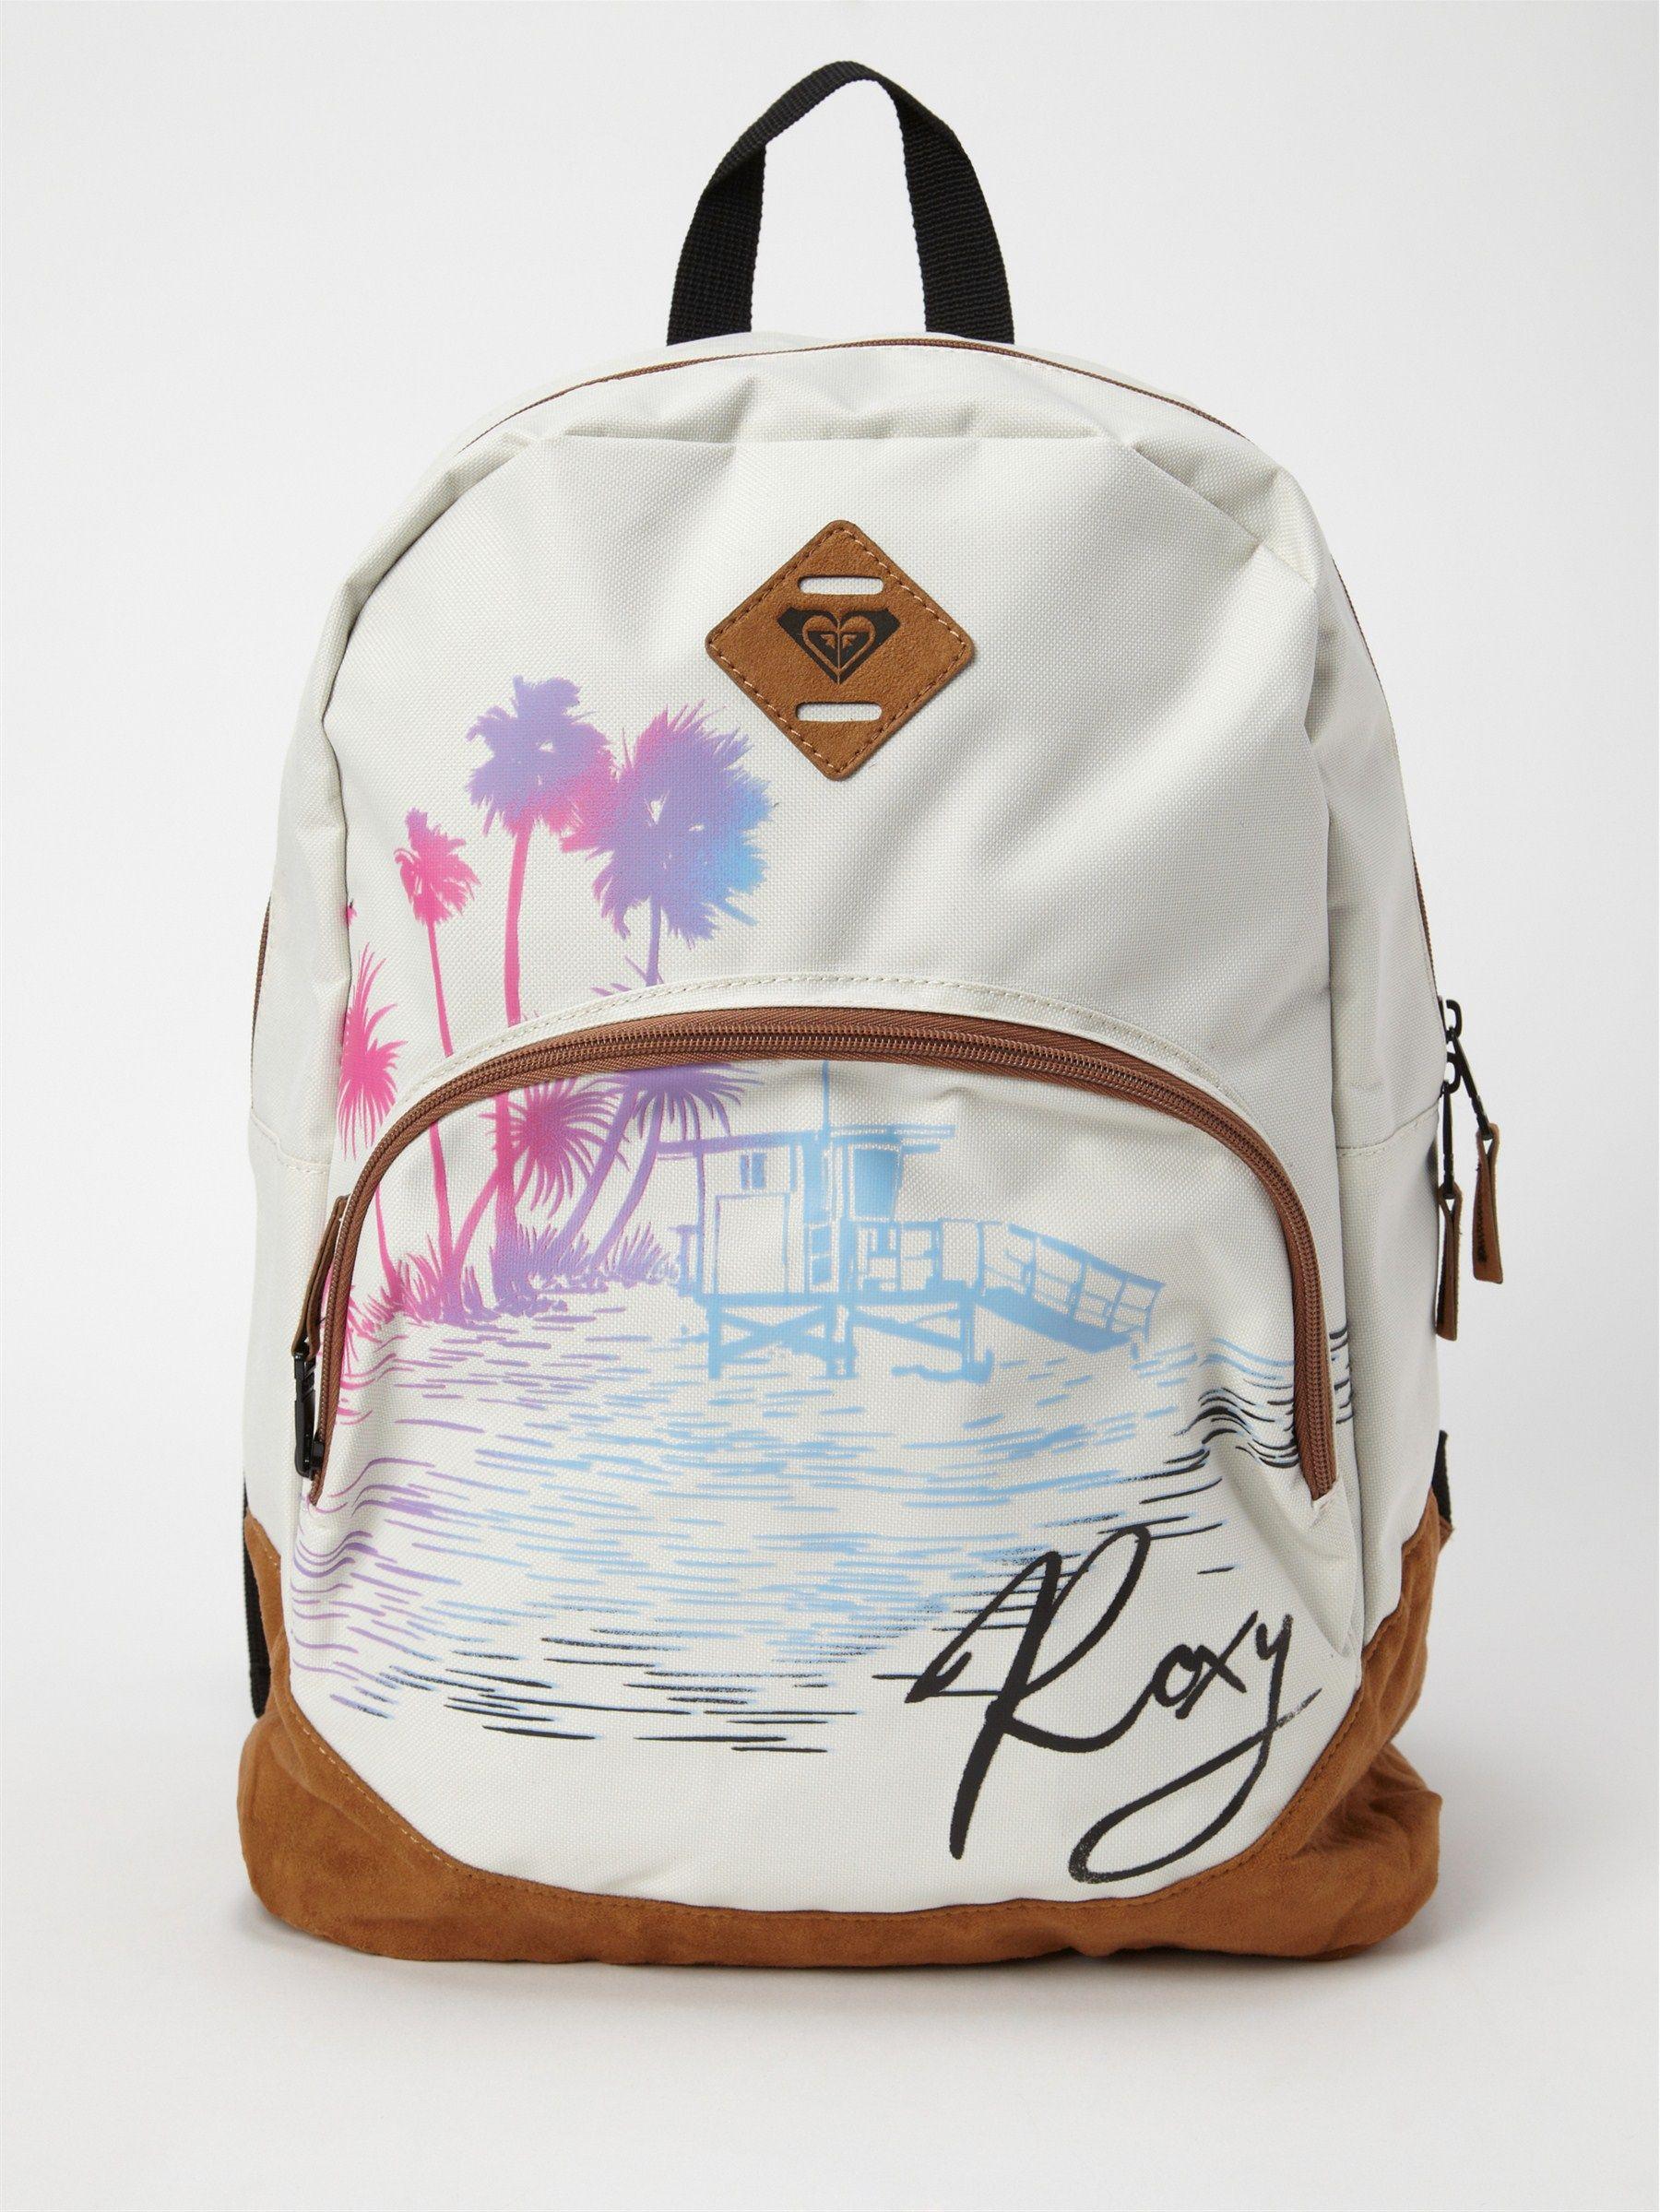 792041930c3 Fairness Backpack | Accessories | Pinterest | Backpacks, Roxy ...